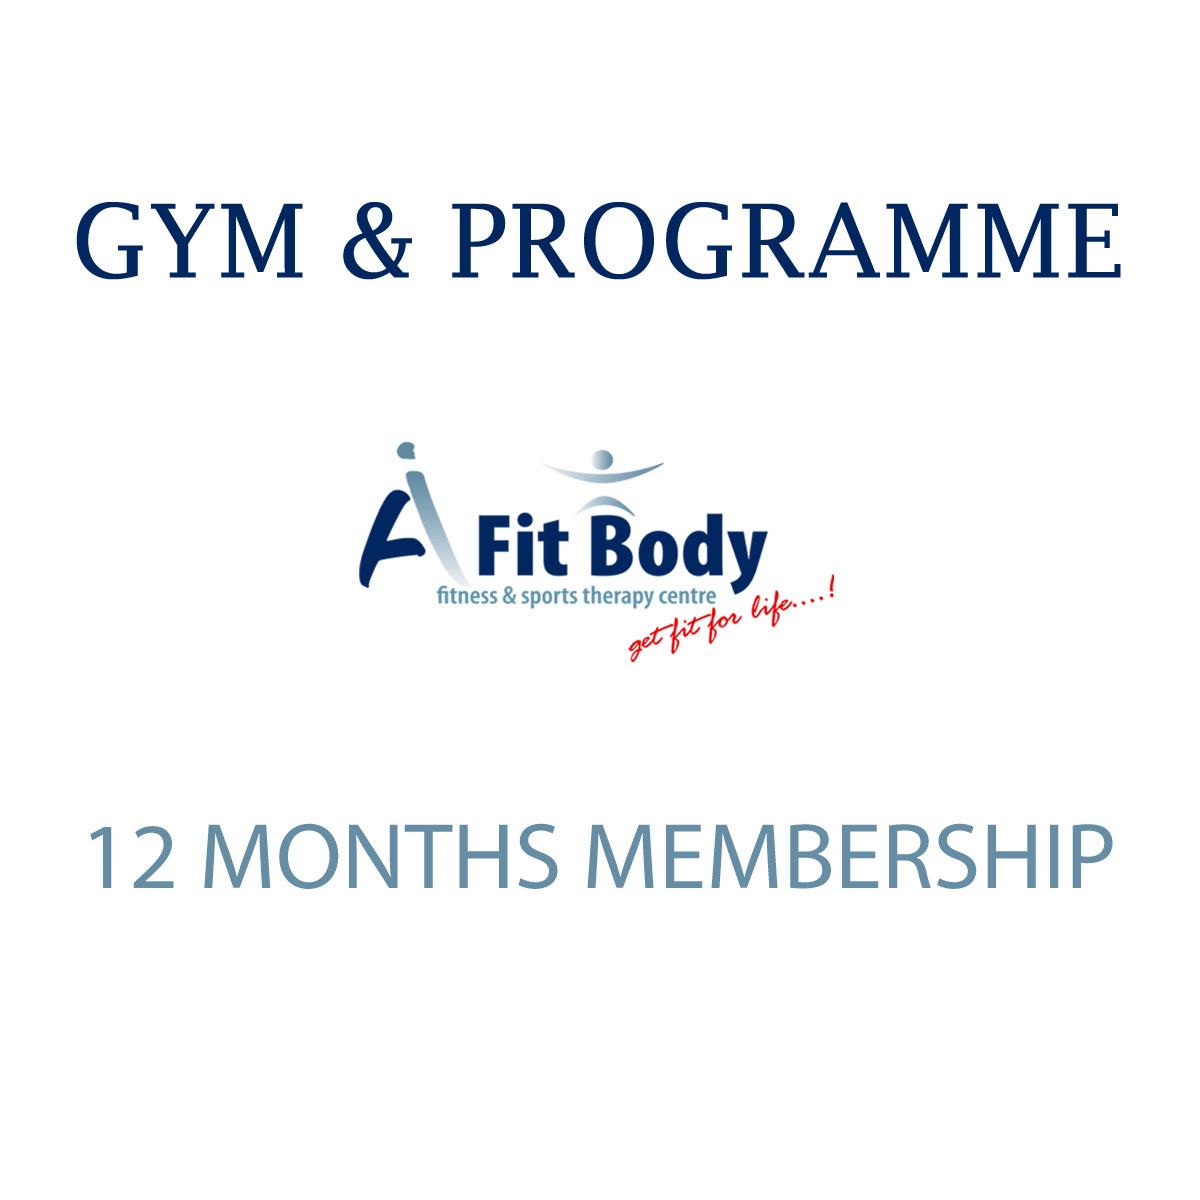 Gym & Programme - 12 Months Membership